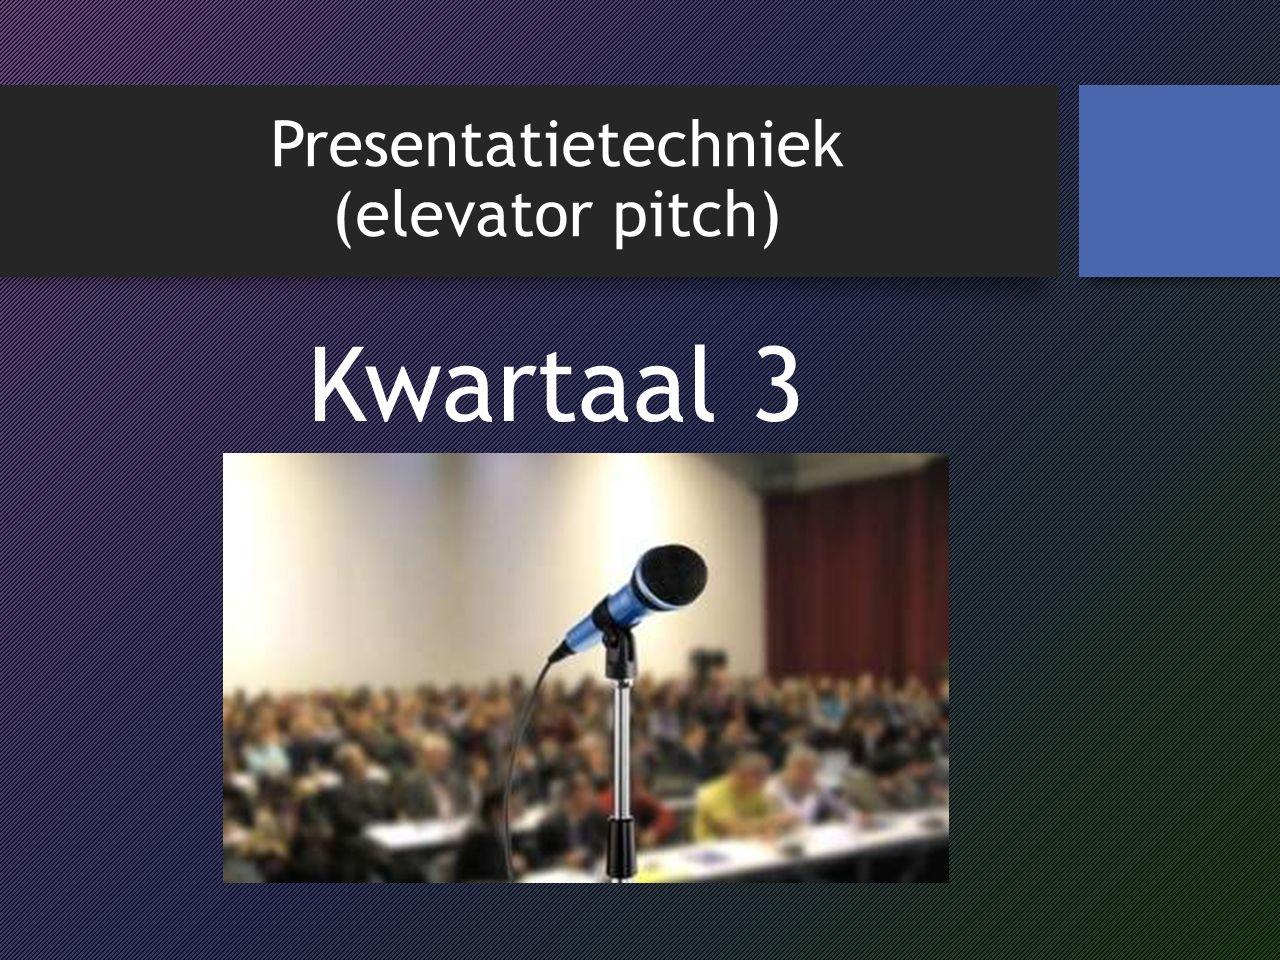 Presentatietechniek (elevator pitch) Kwartaal 3